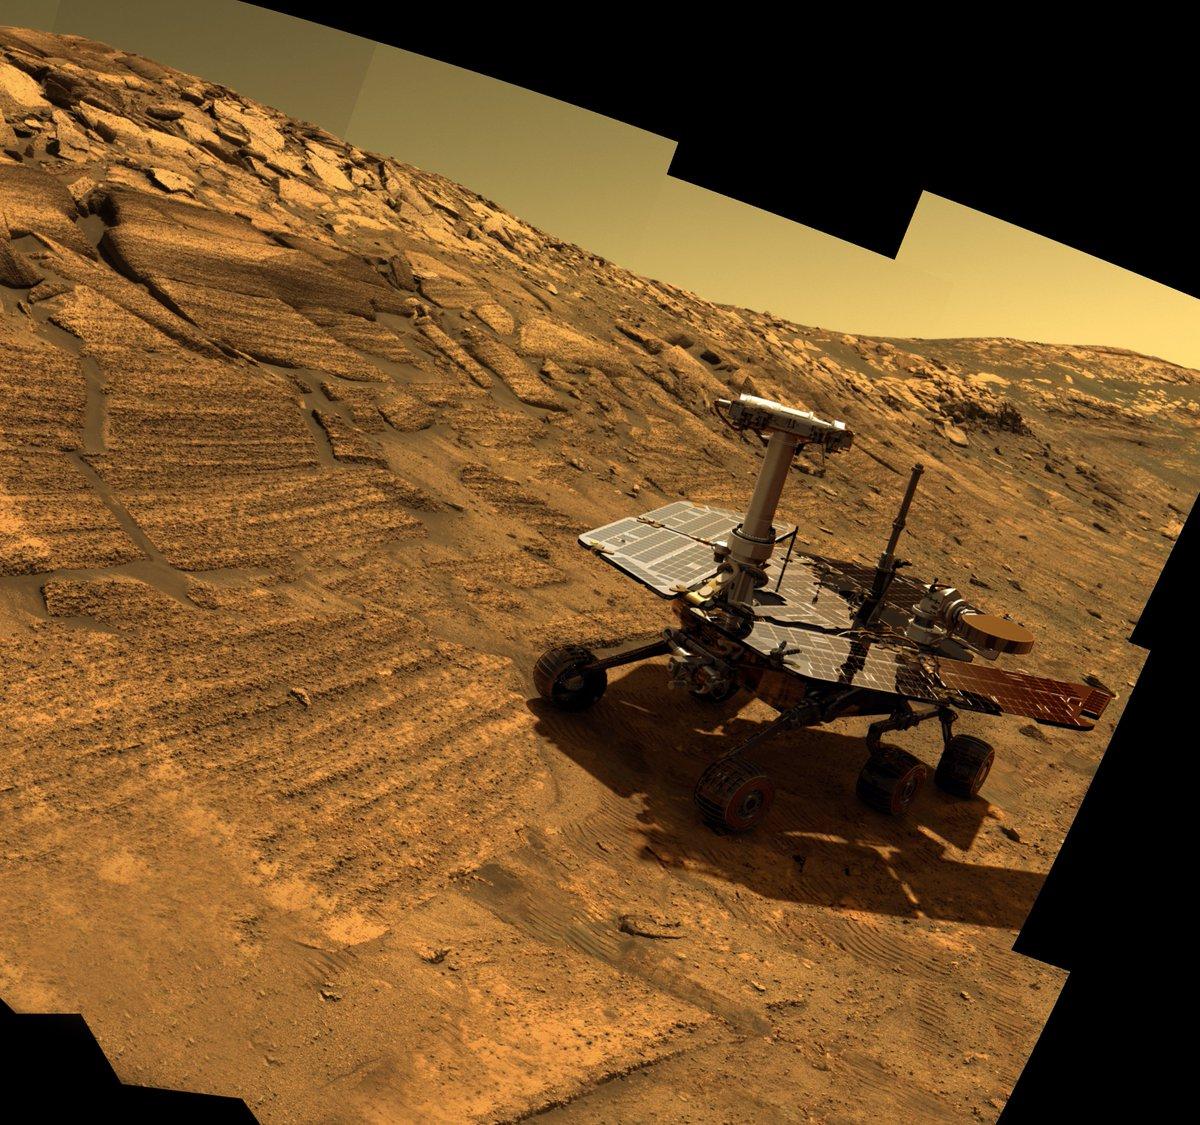 mars mission 2019 - HD2455×2302